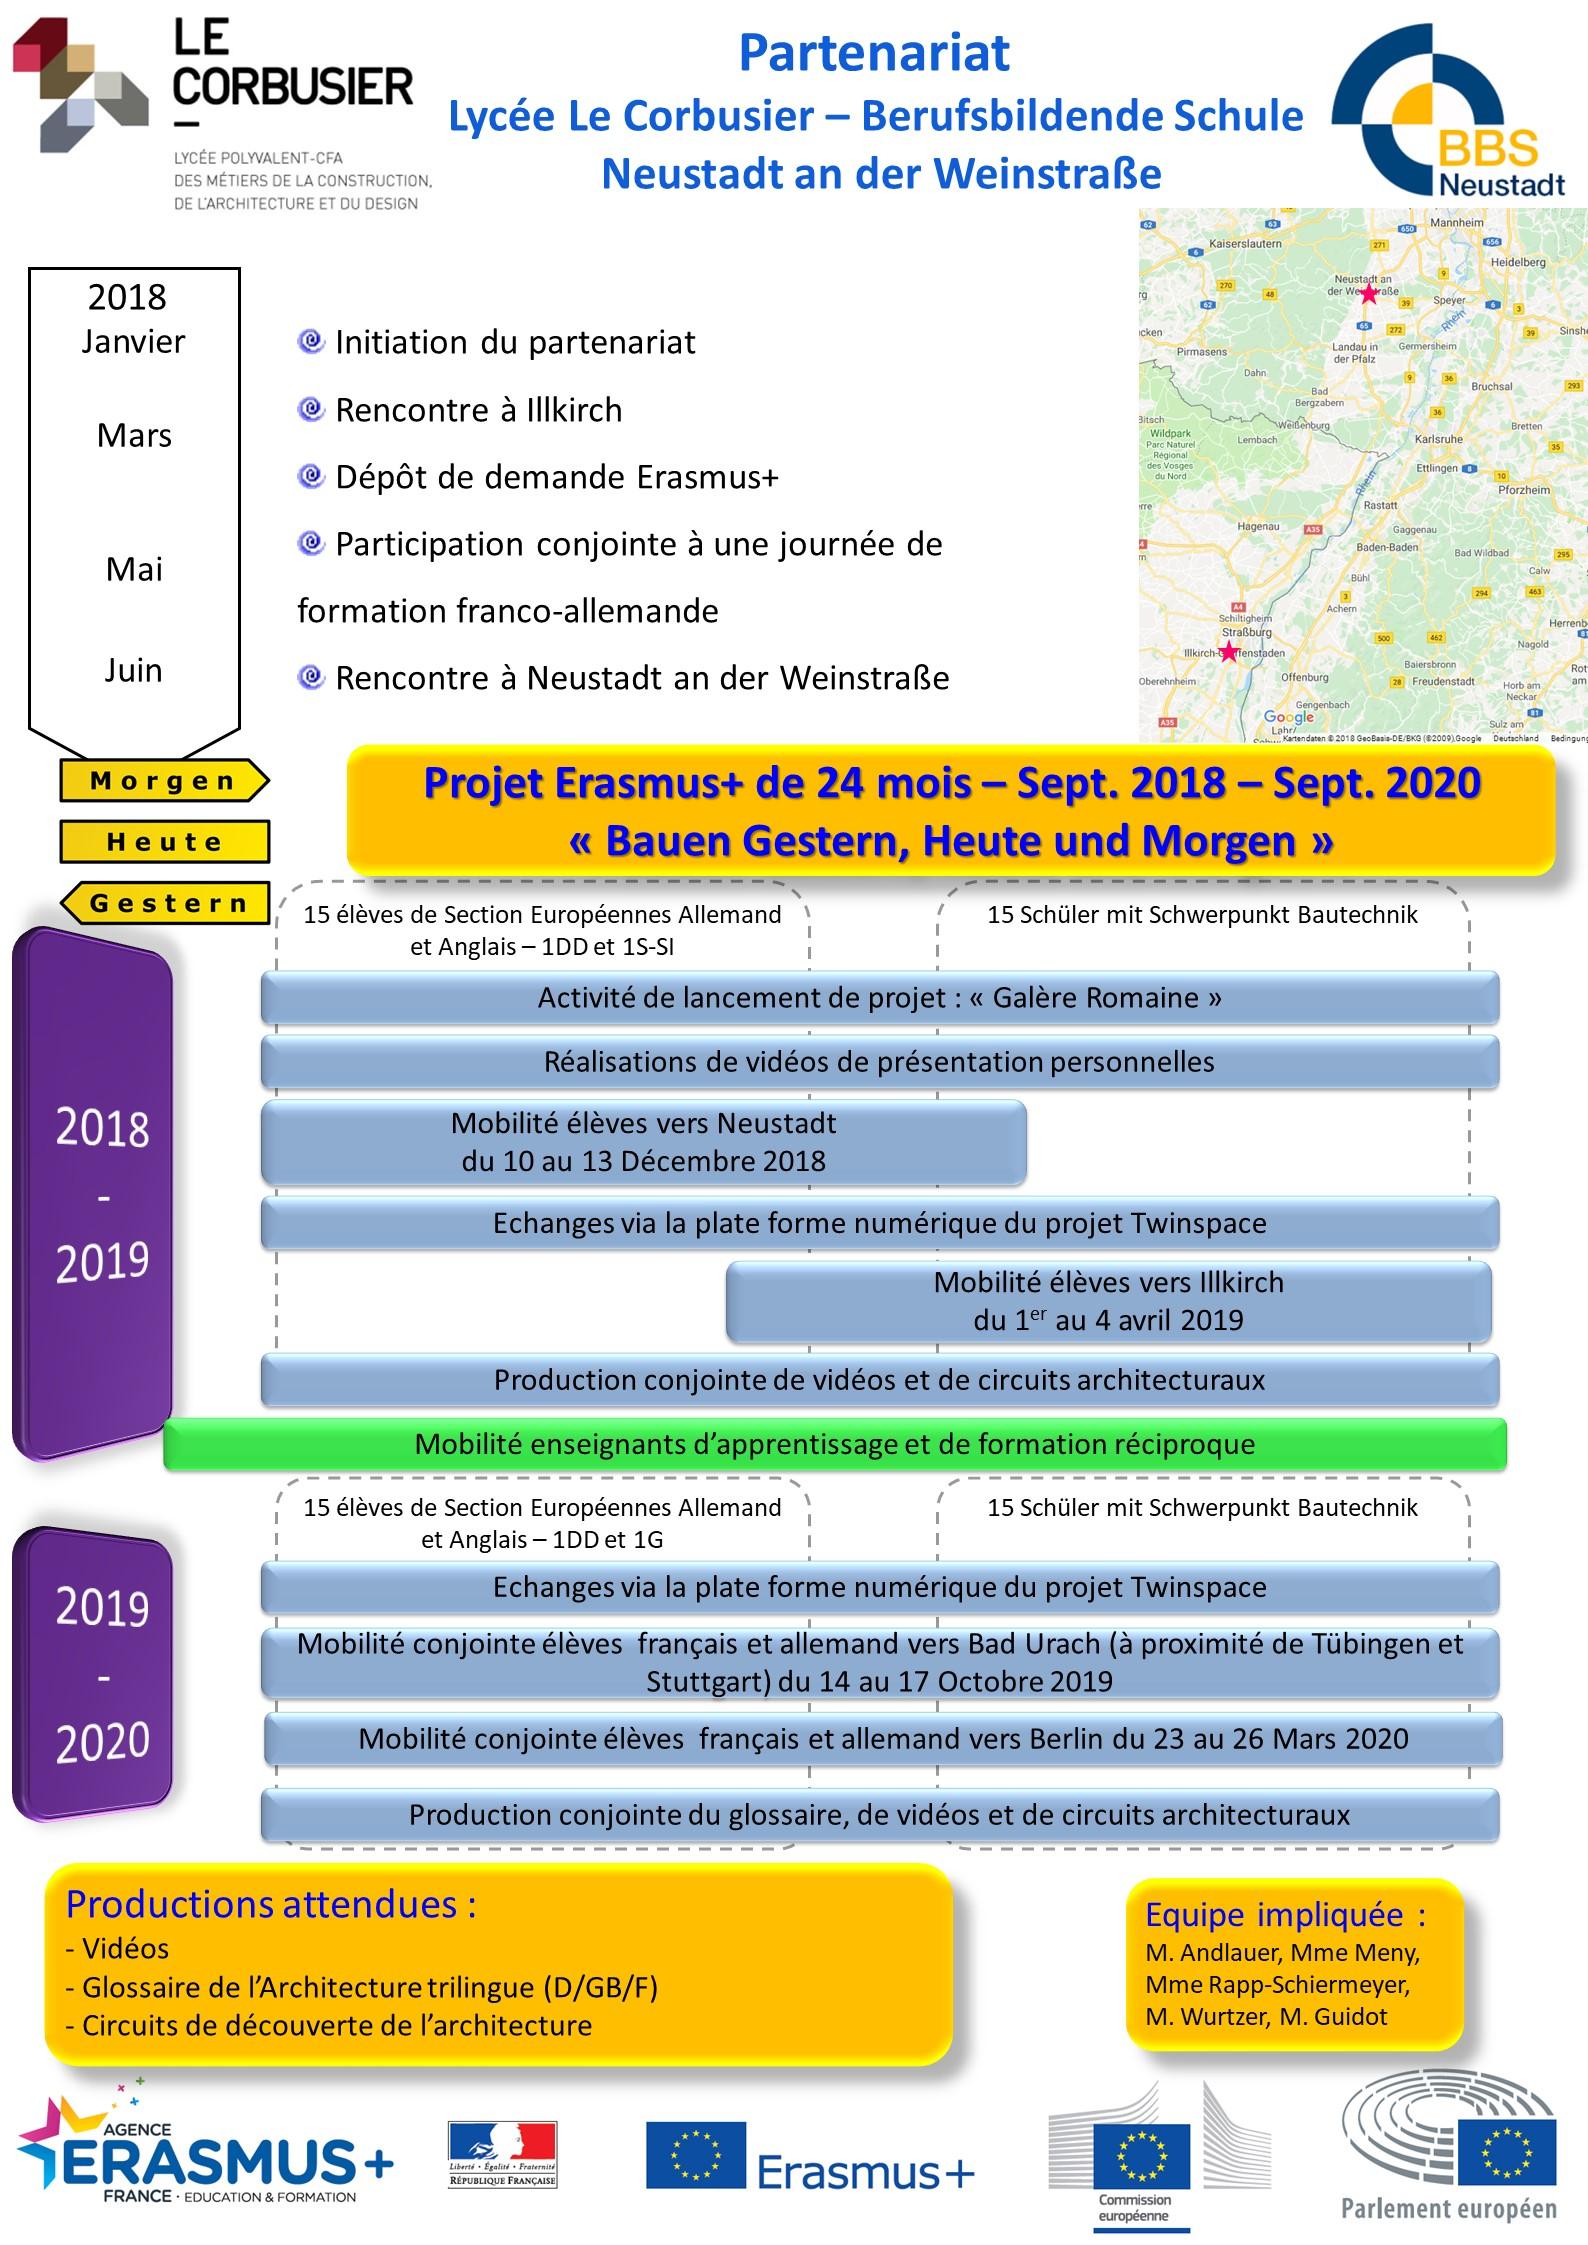 Poster-presentation-partenariat-Neustadt-2018-2020